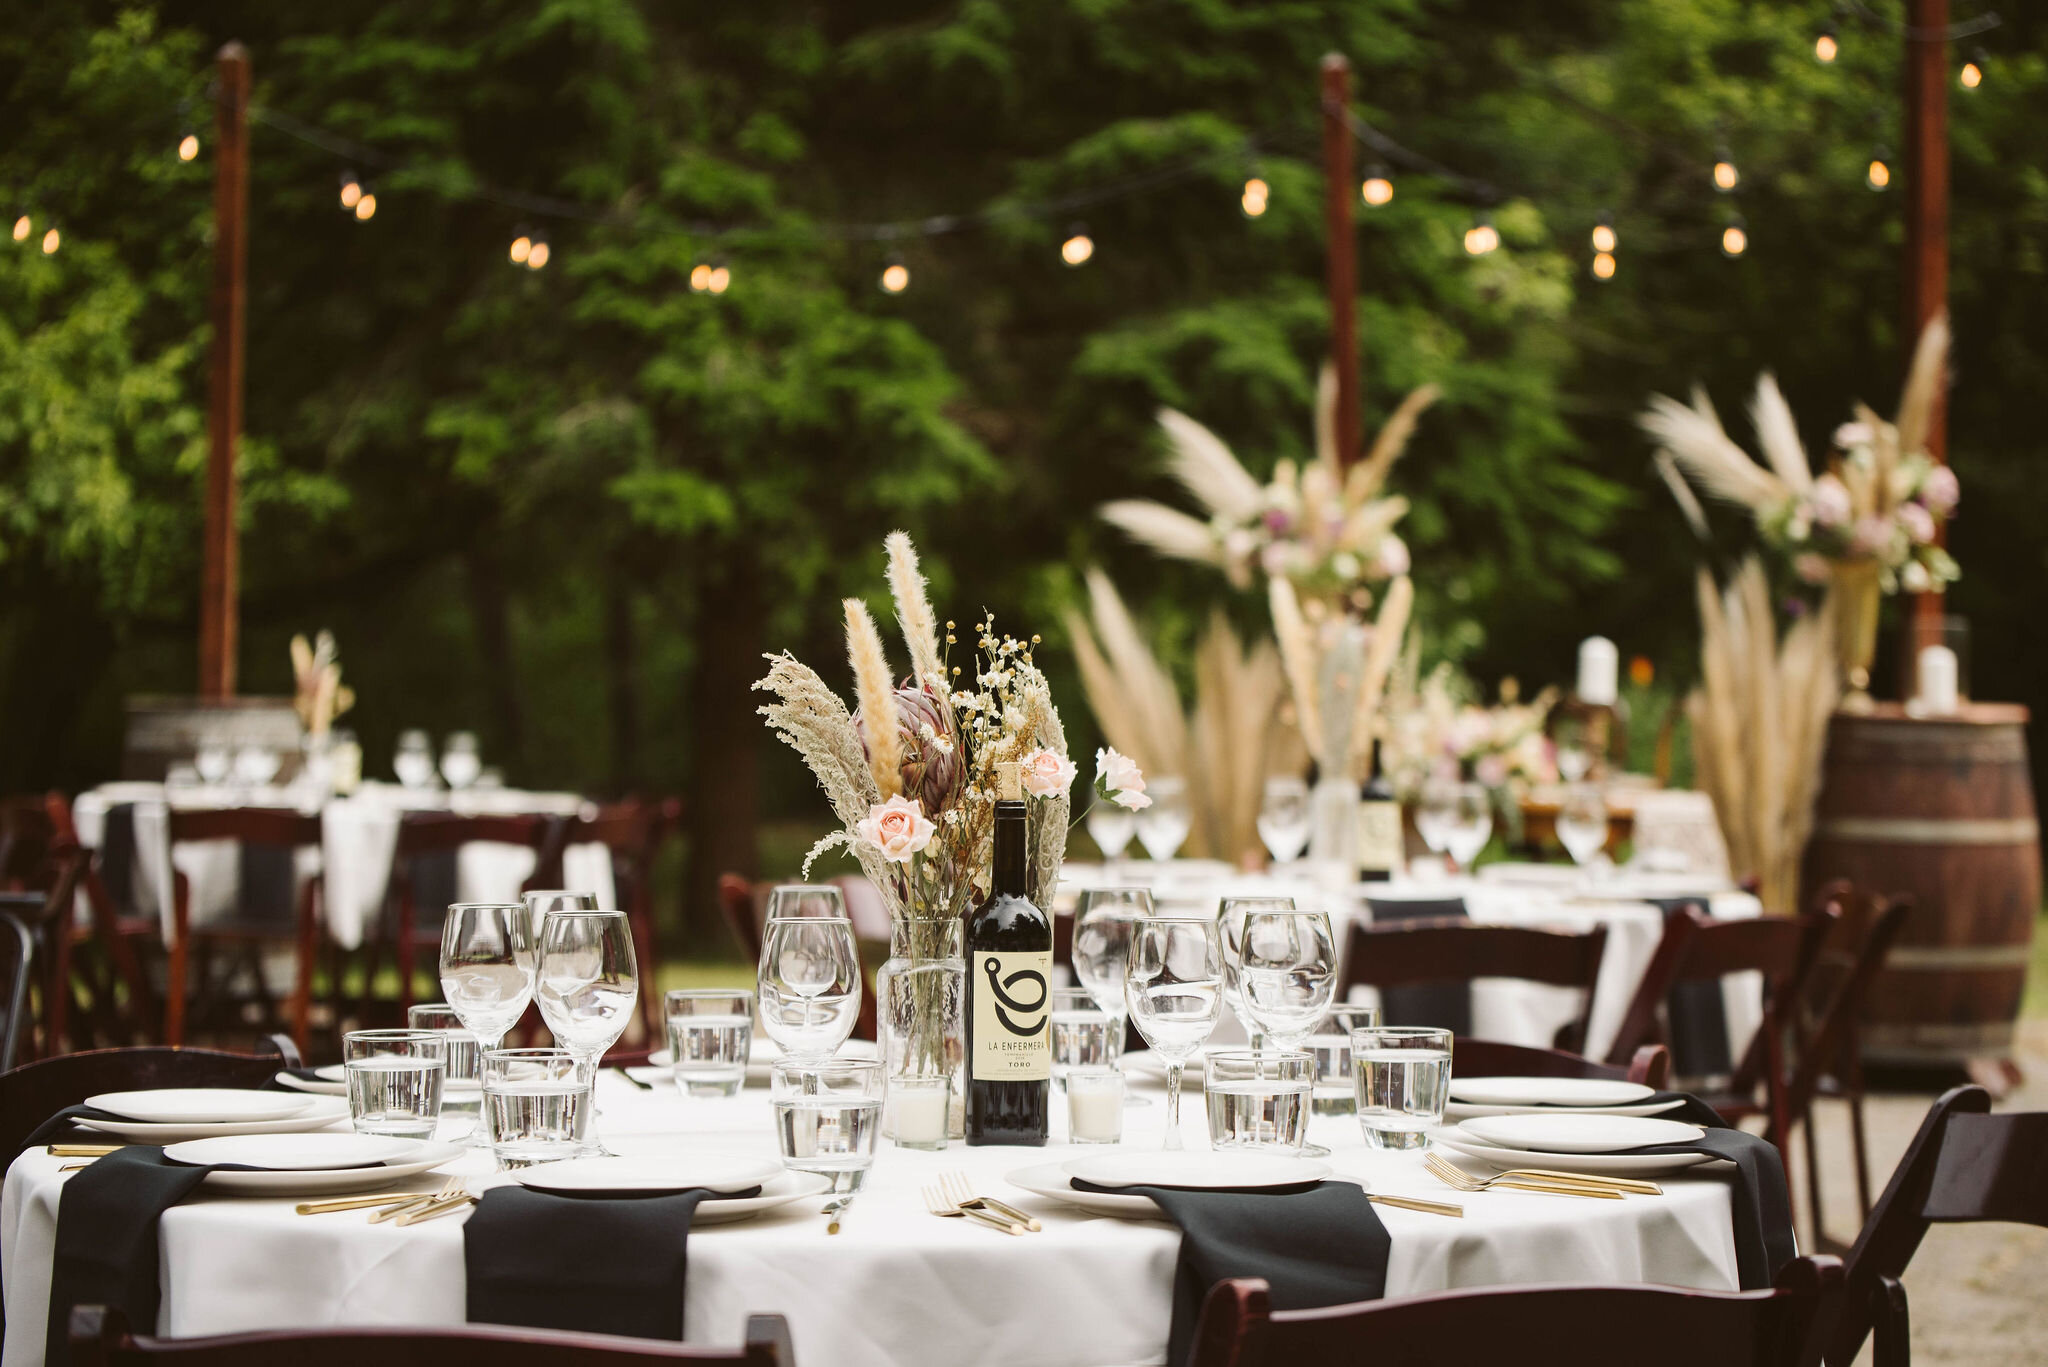 Venture-Retreat-Center-Wedding-Pescadero-Sat-Aaron-Pritam-The-Shalom-Imaginative-513.jpg